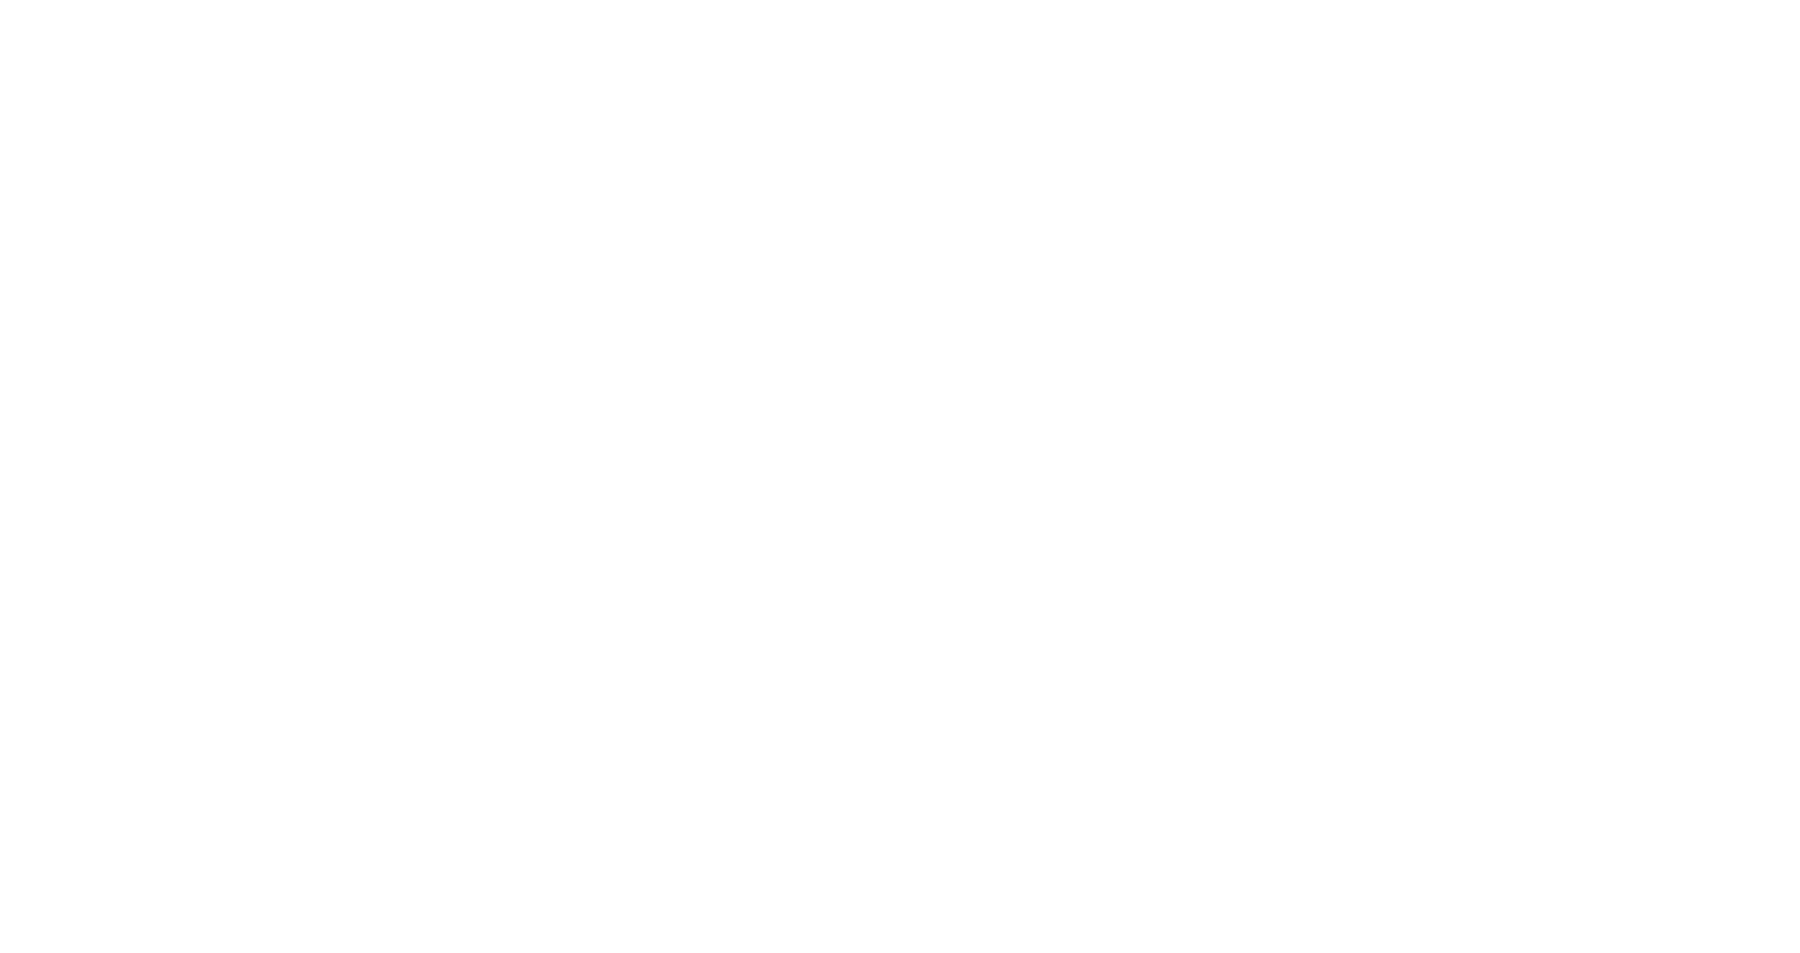 mba_member_logo_white.png